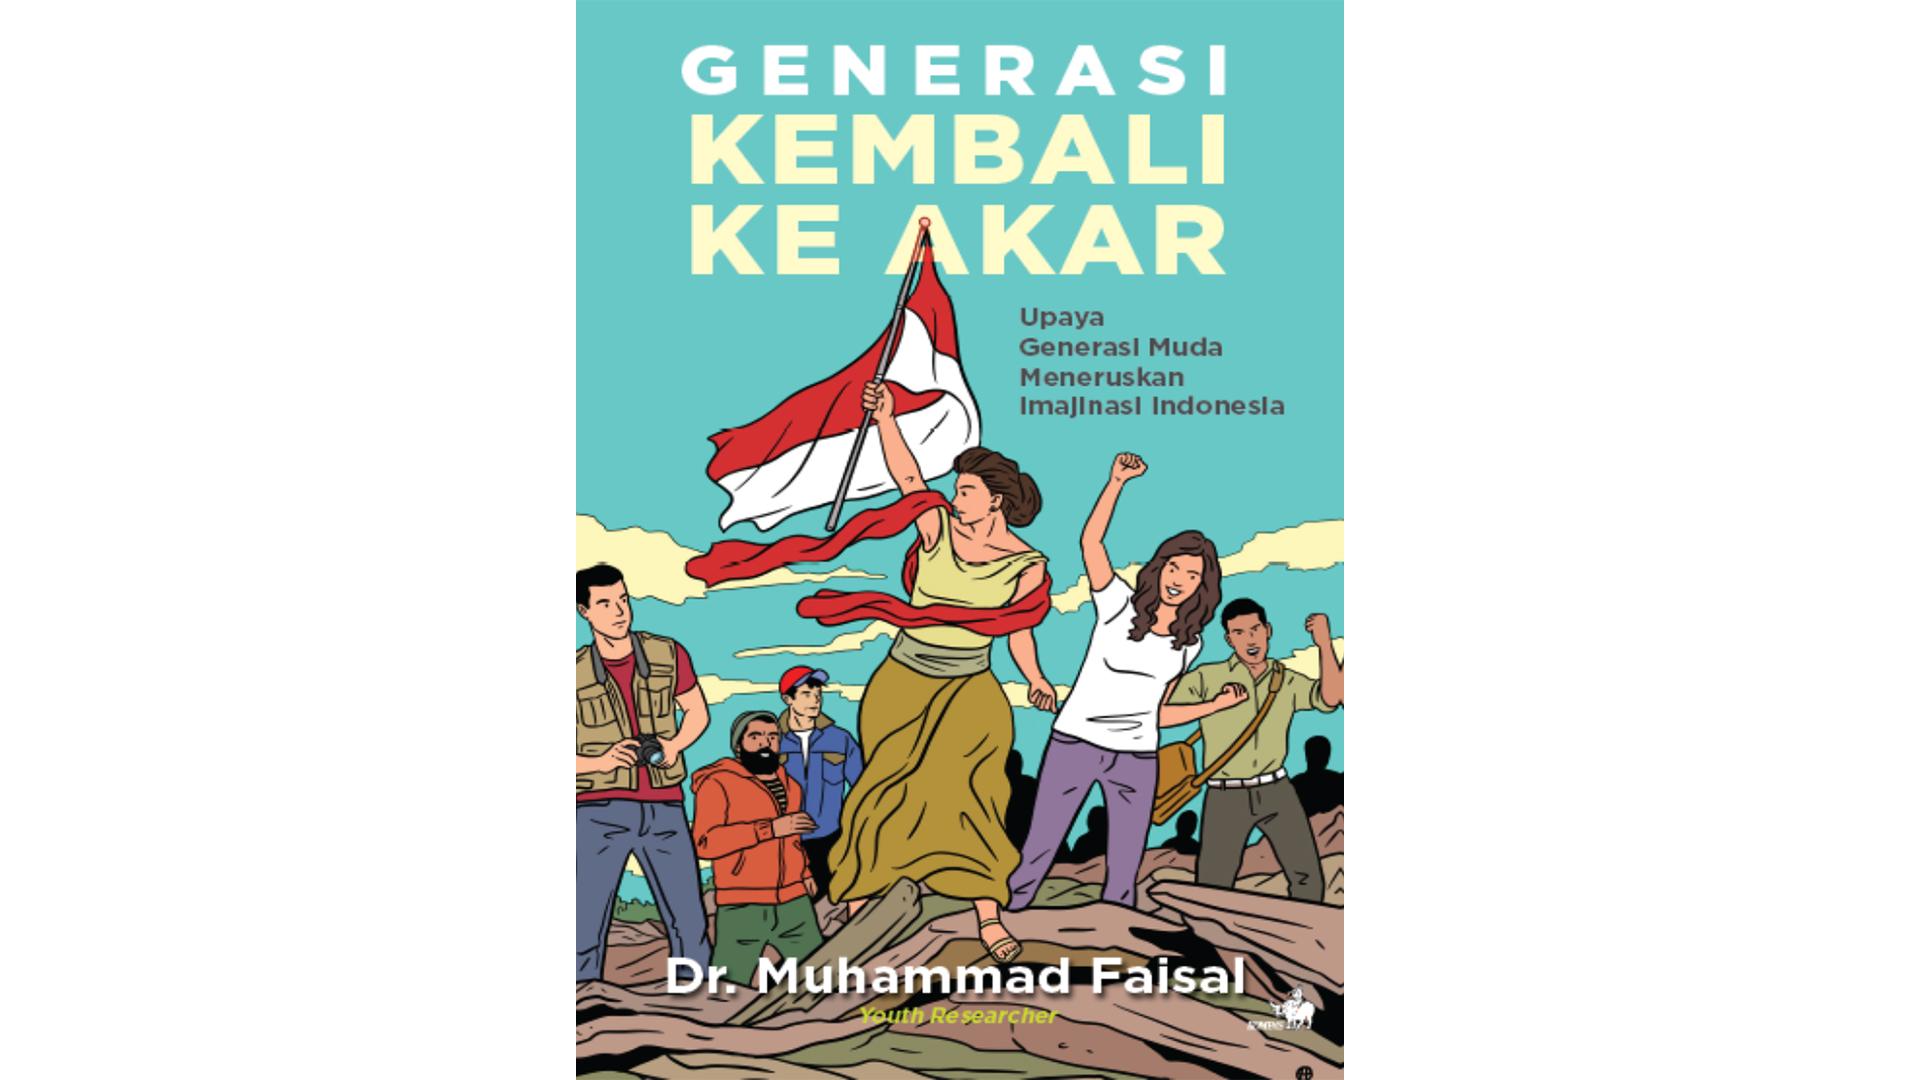 Buku Generasi Kembali ke Akar   Foto: gerai.kompas.id